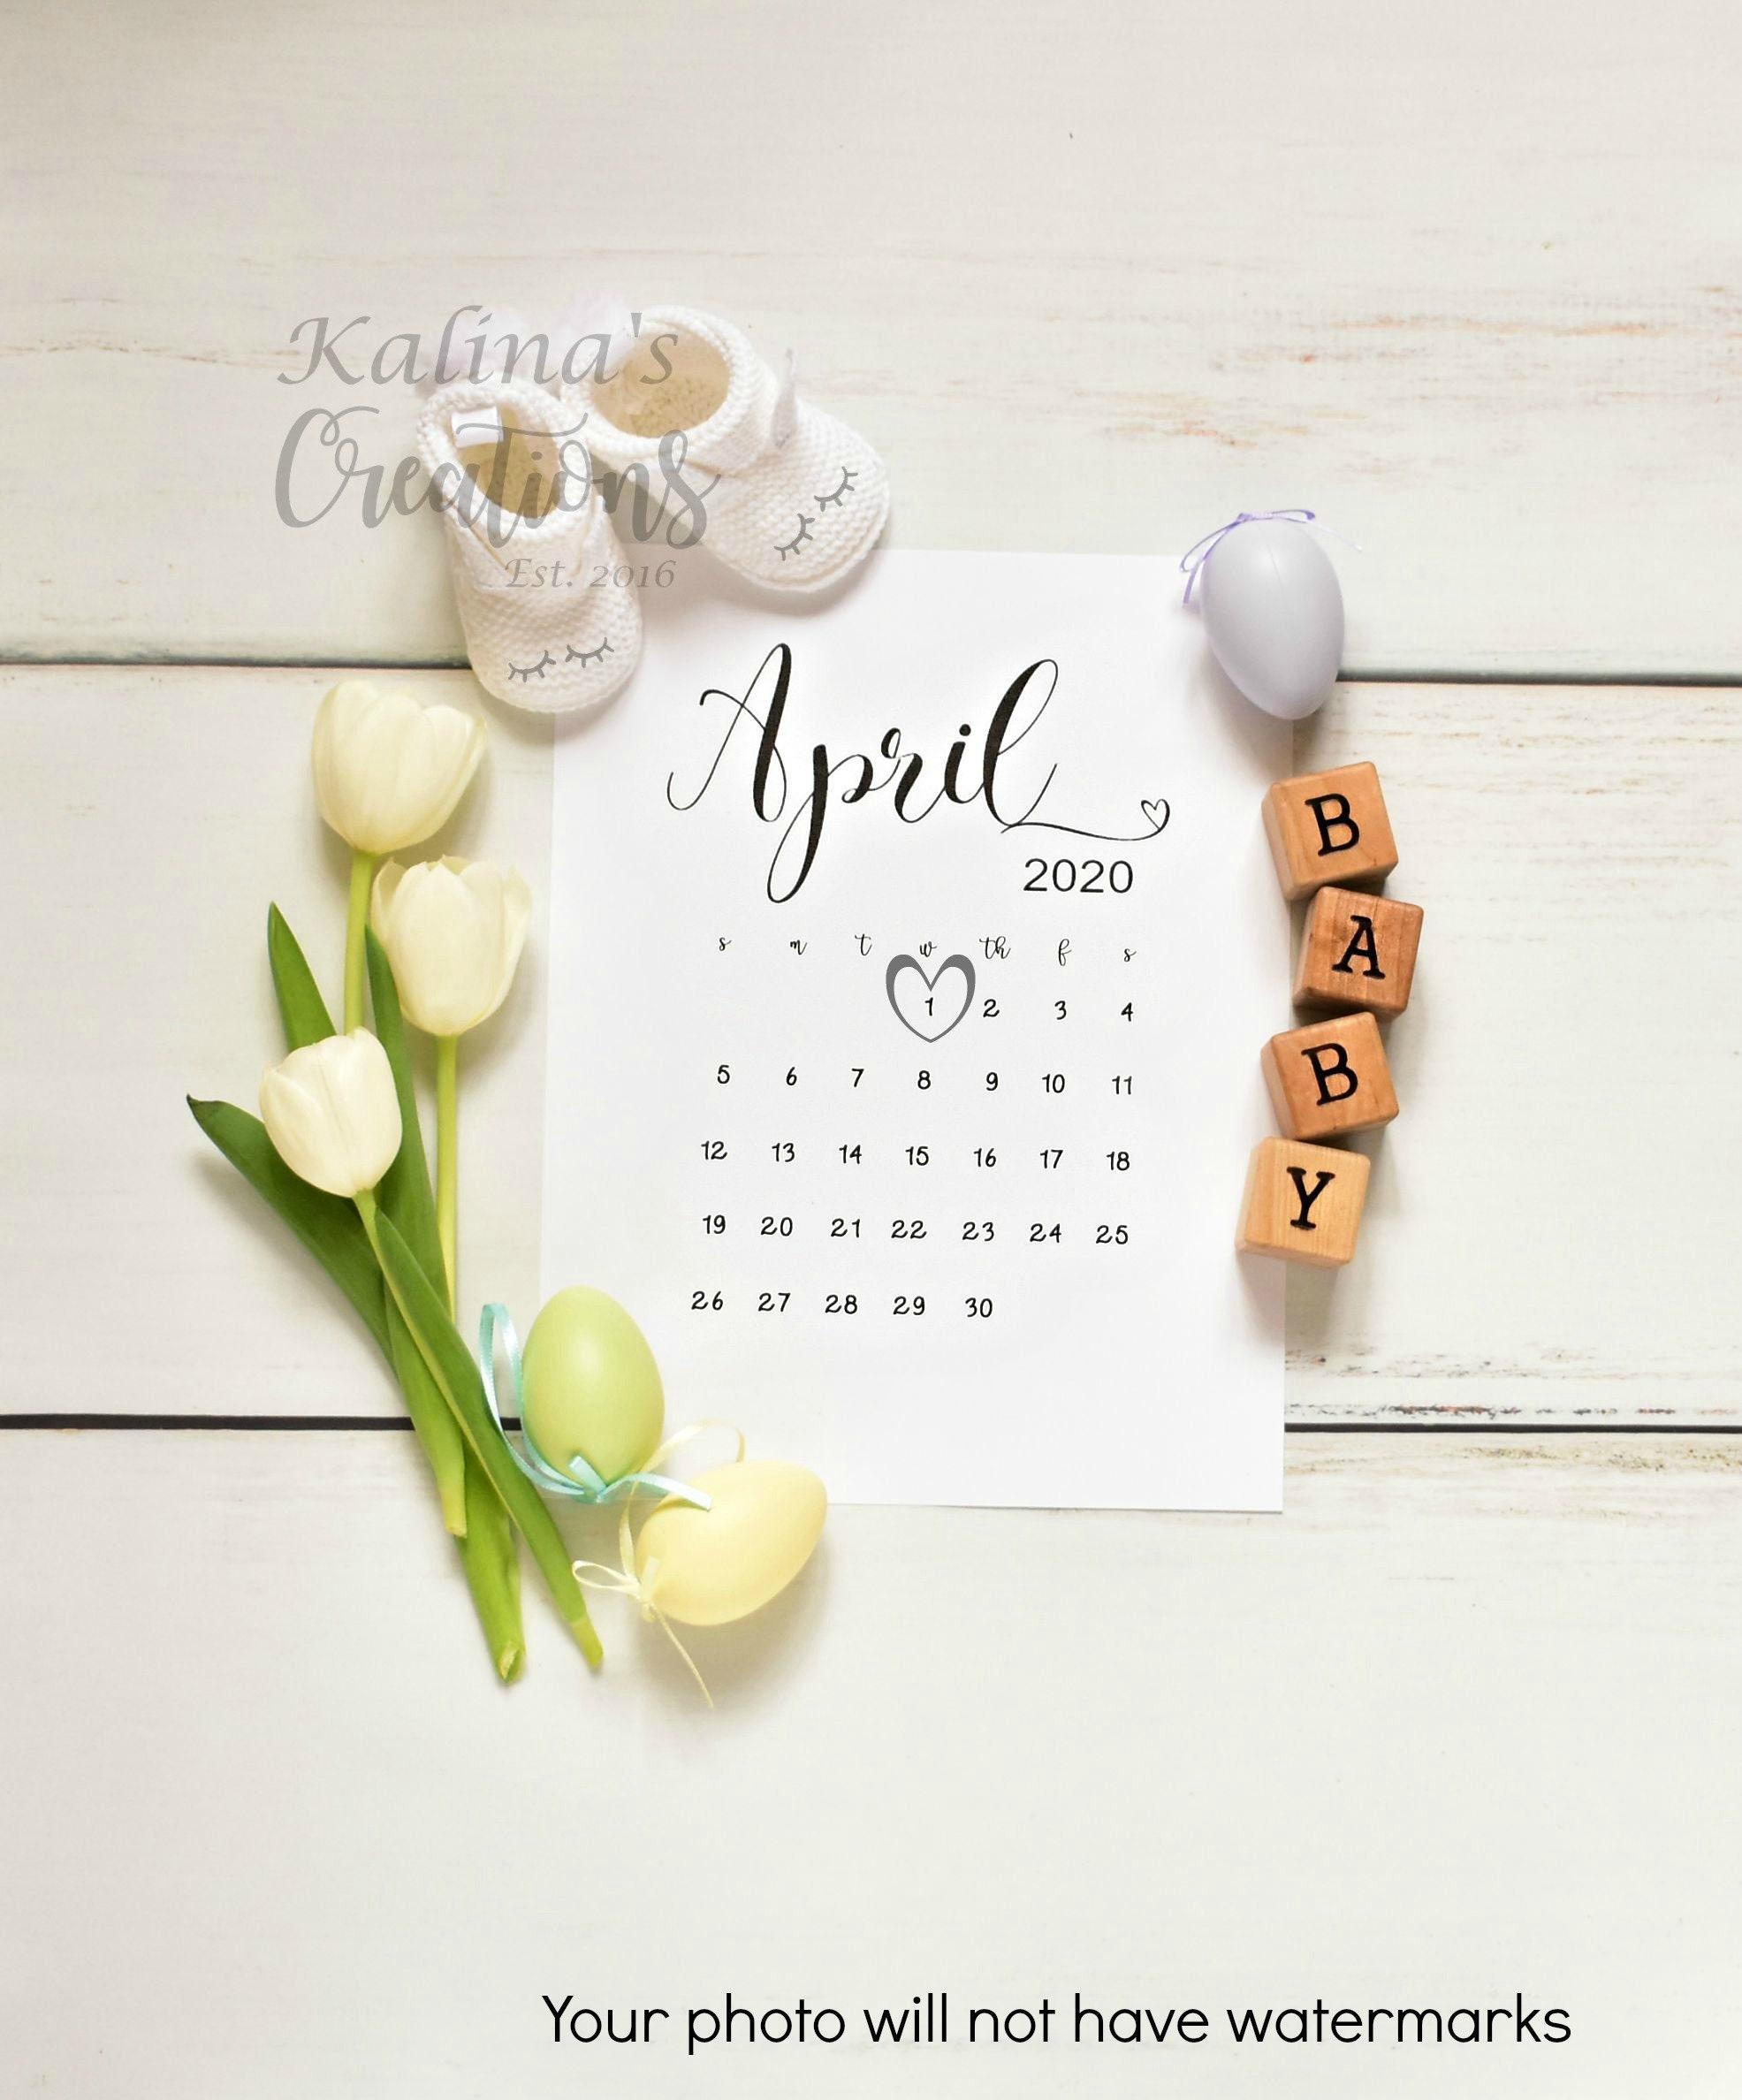 Easter 2020 Calendar.April 2020 Easter Pregnancy Announcement For Social Media